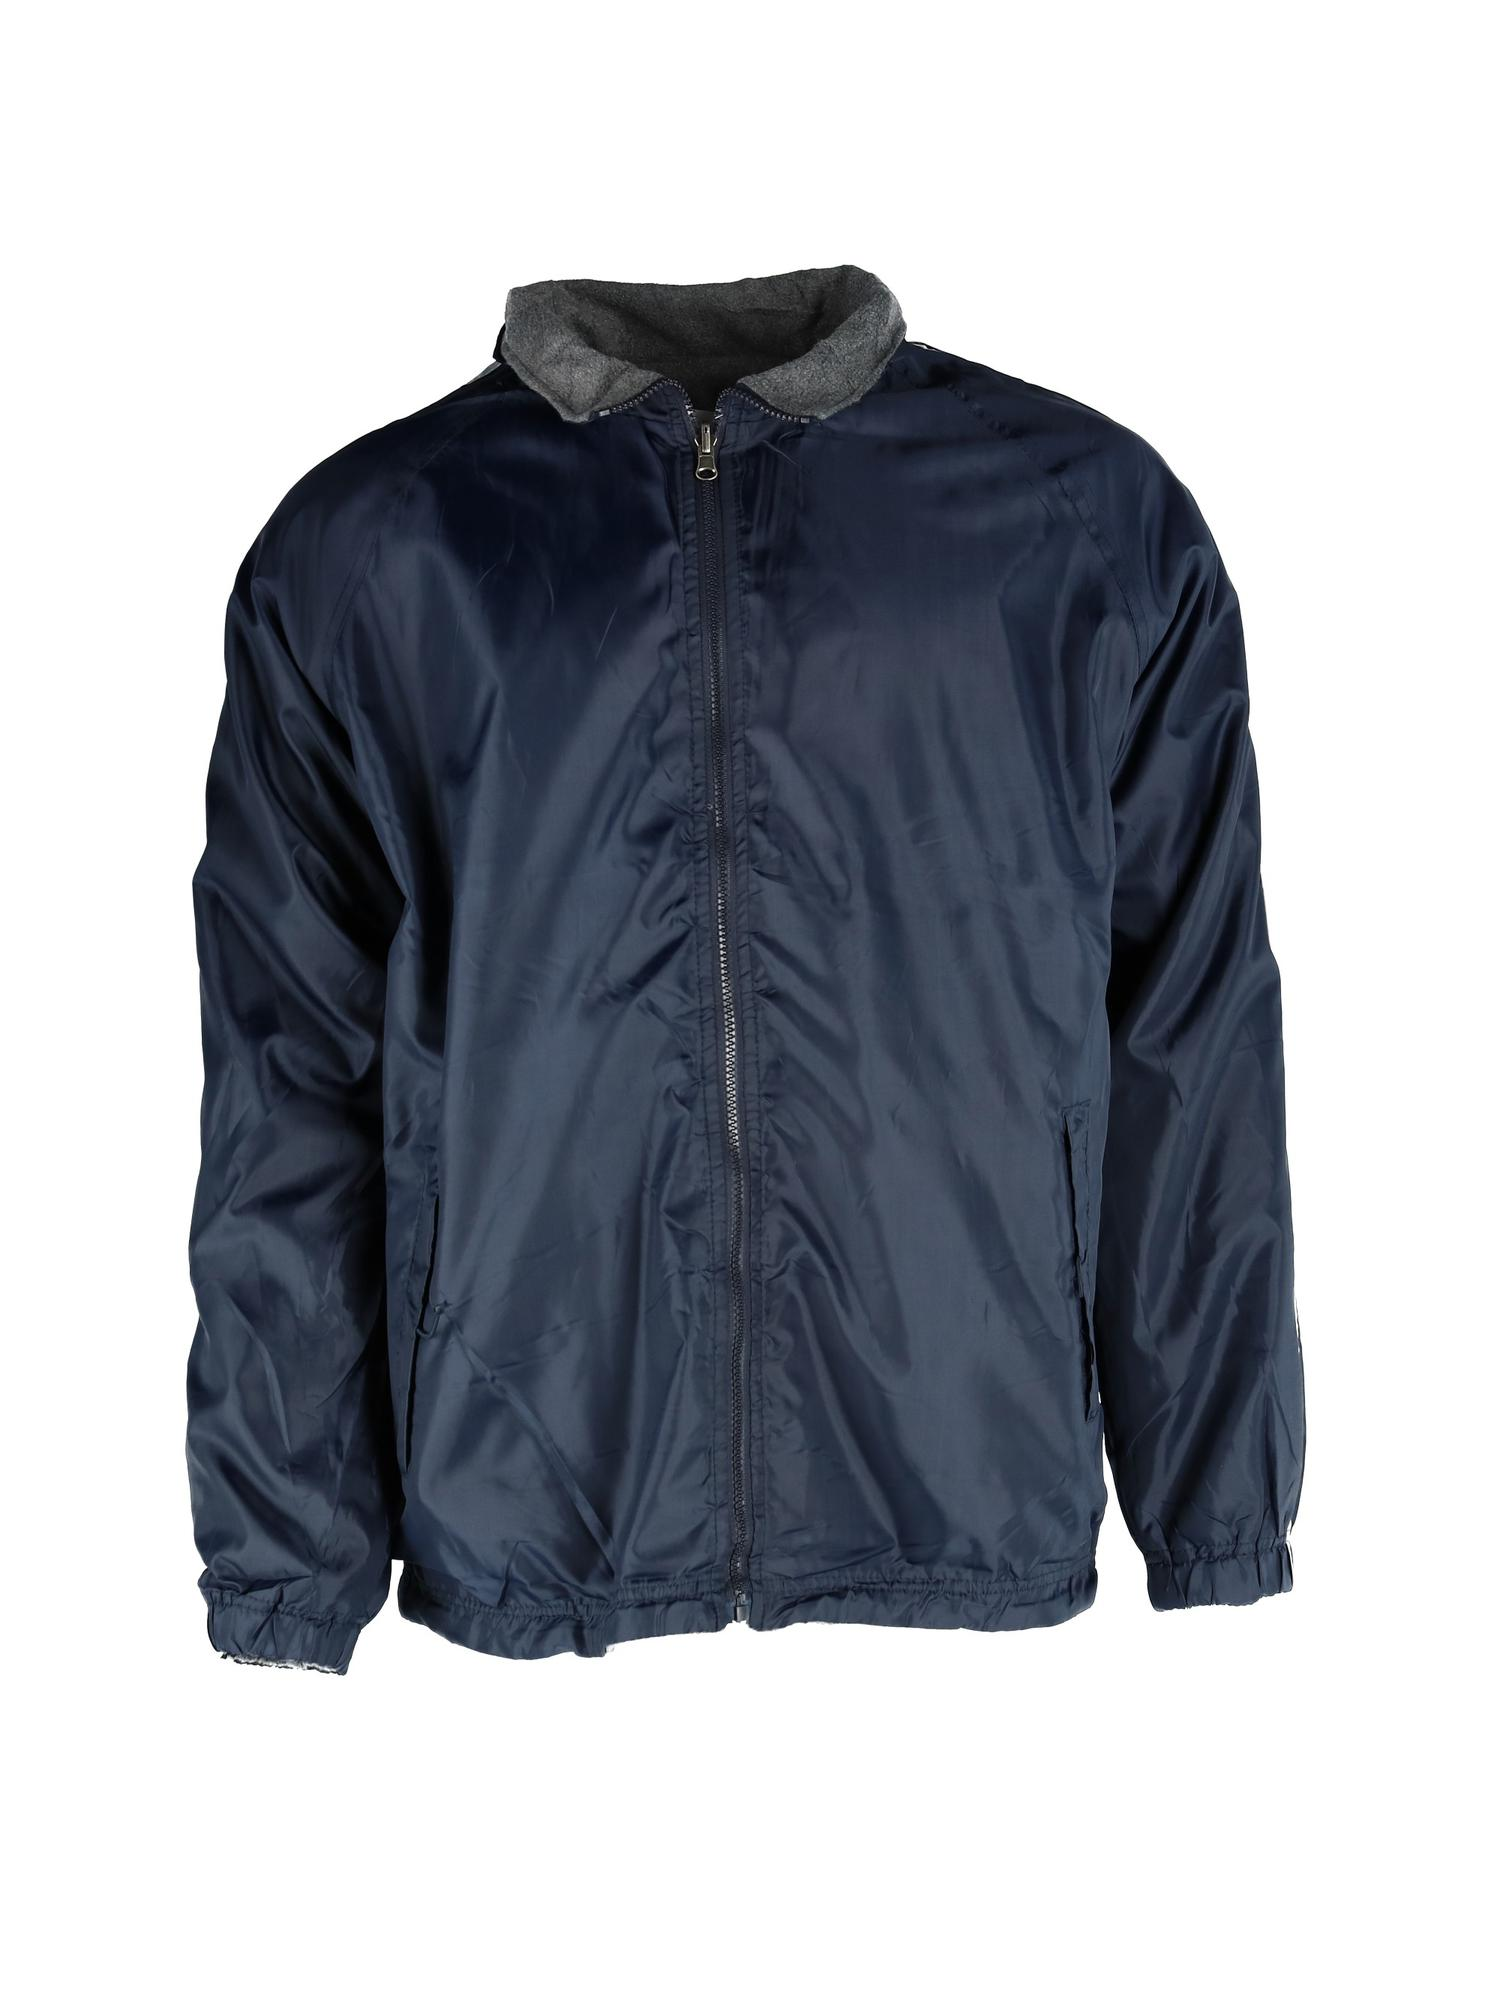 Ten West Apparel Mens Reversible Fleece and Windbreaker Rain Jacket with Stripes